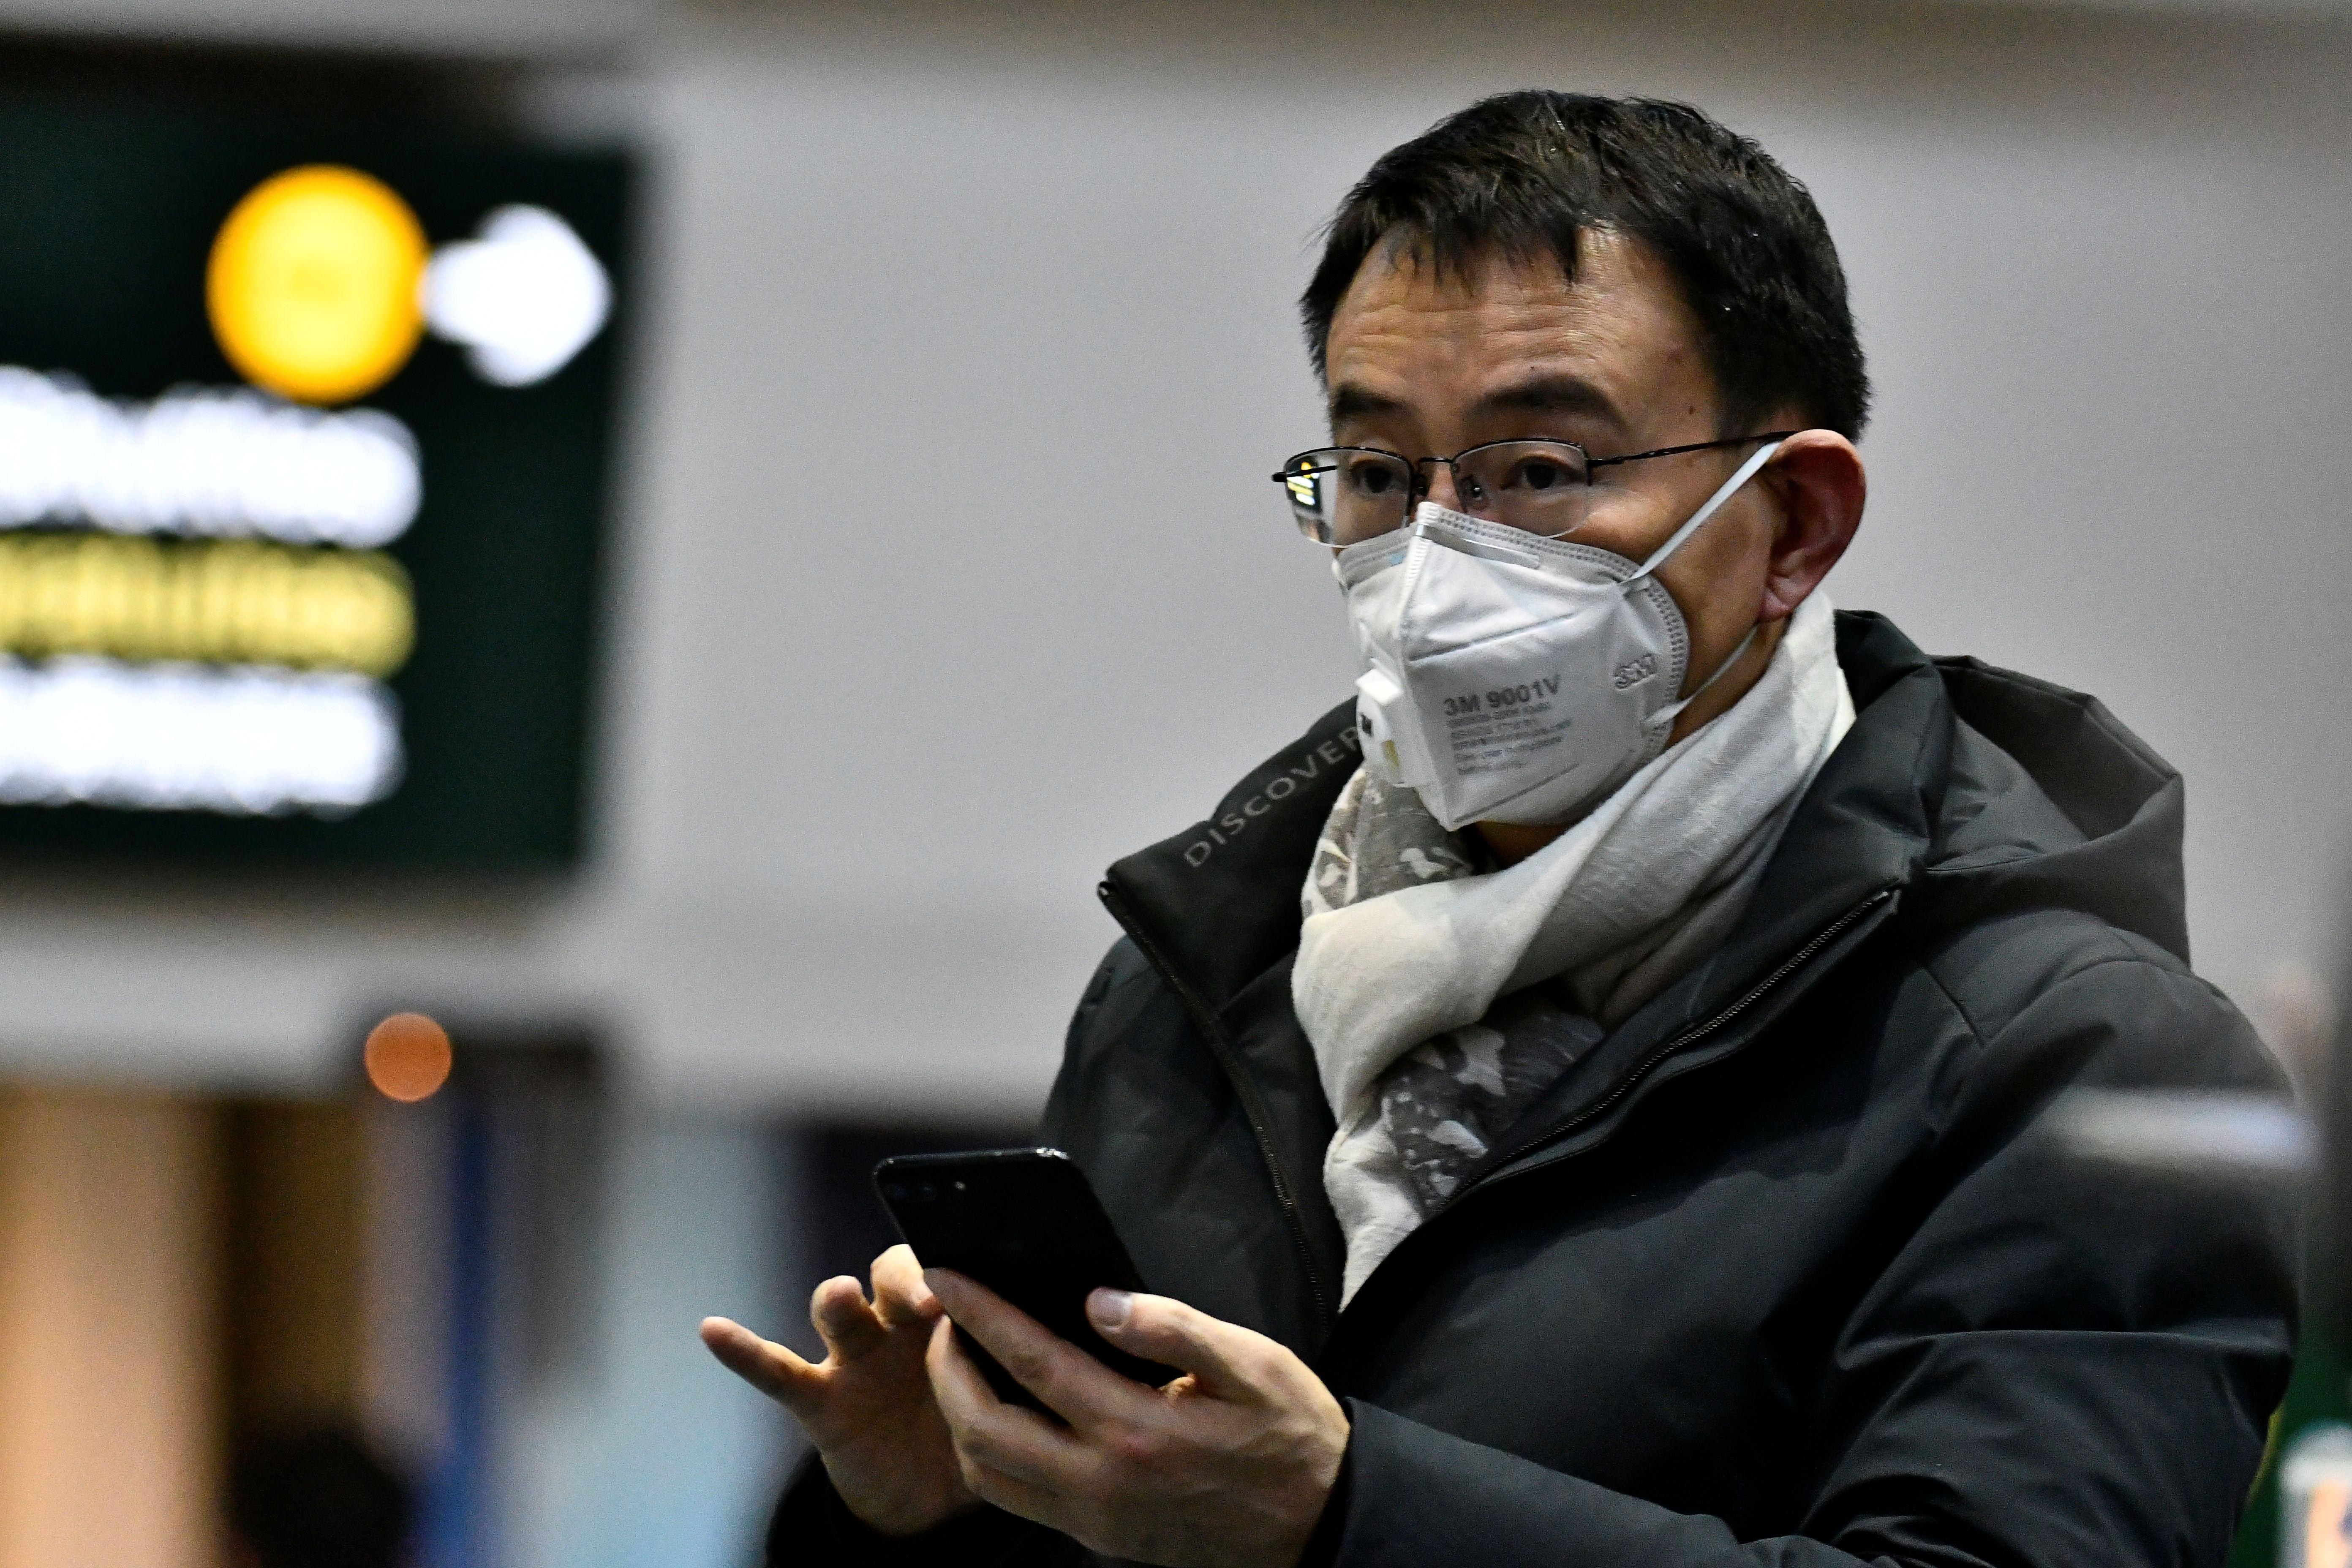 Ministério da Saúde descarta caso de coronavírus em Niterói